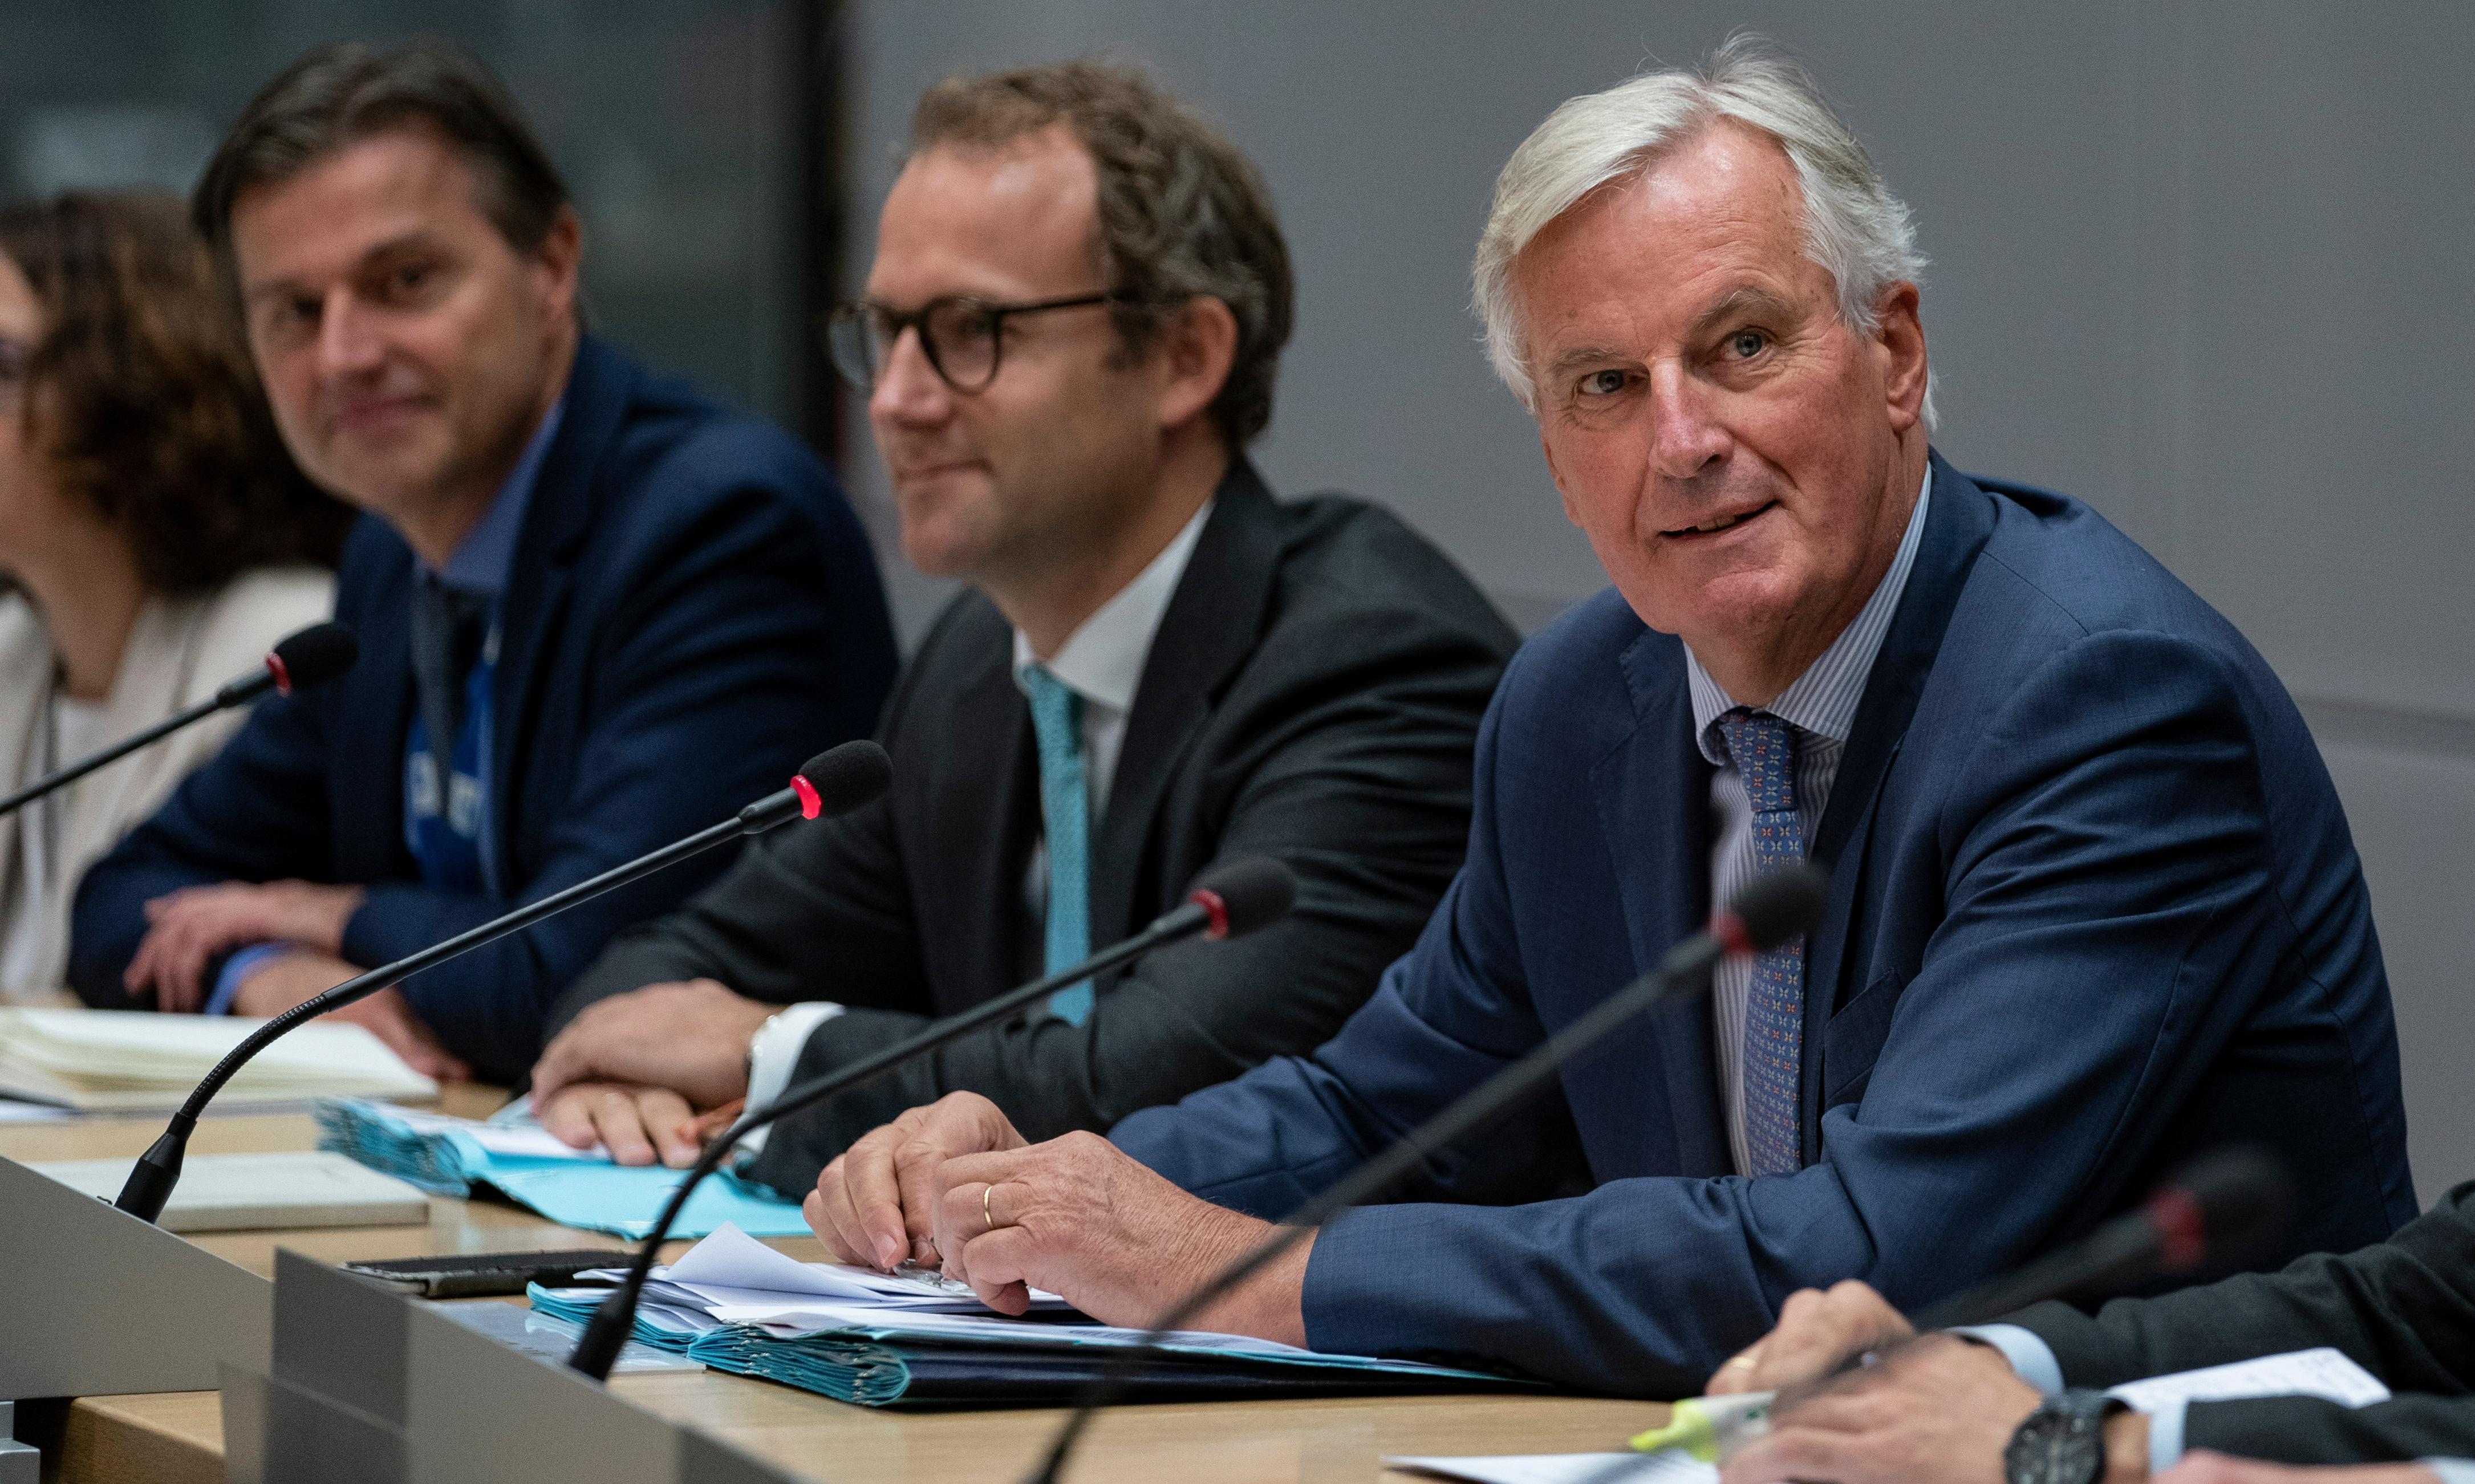 Talks 'going backwards' as UK asks EU to keep its proposals secret